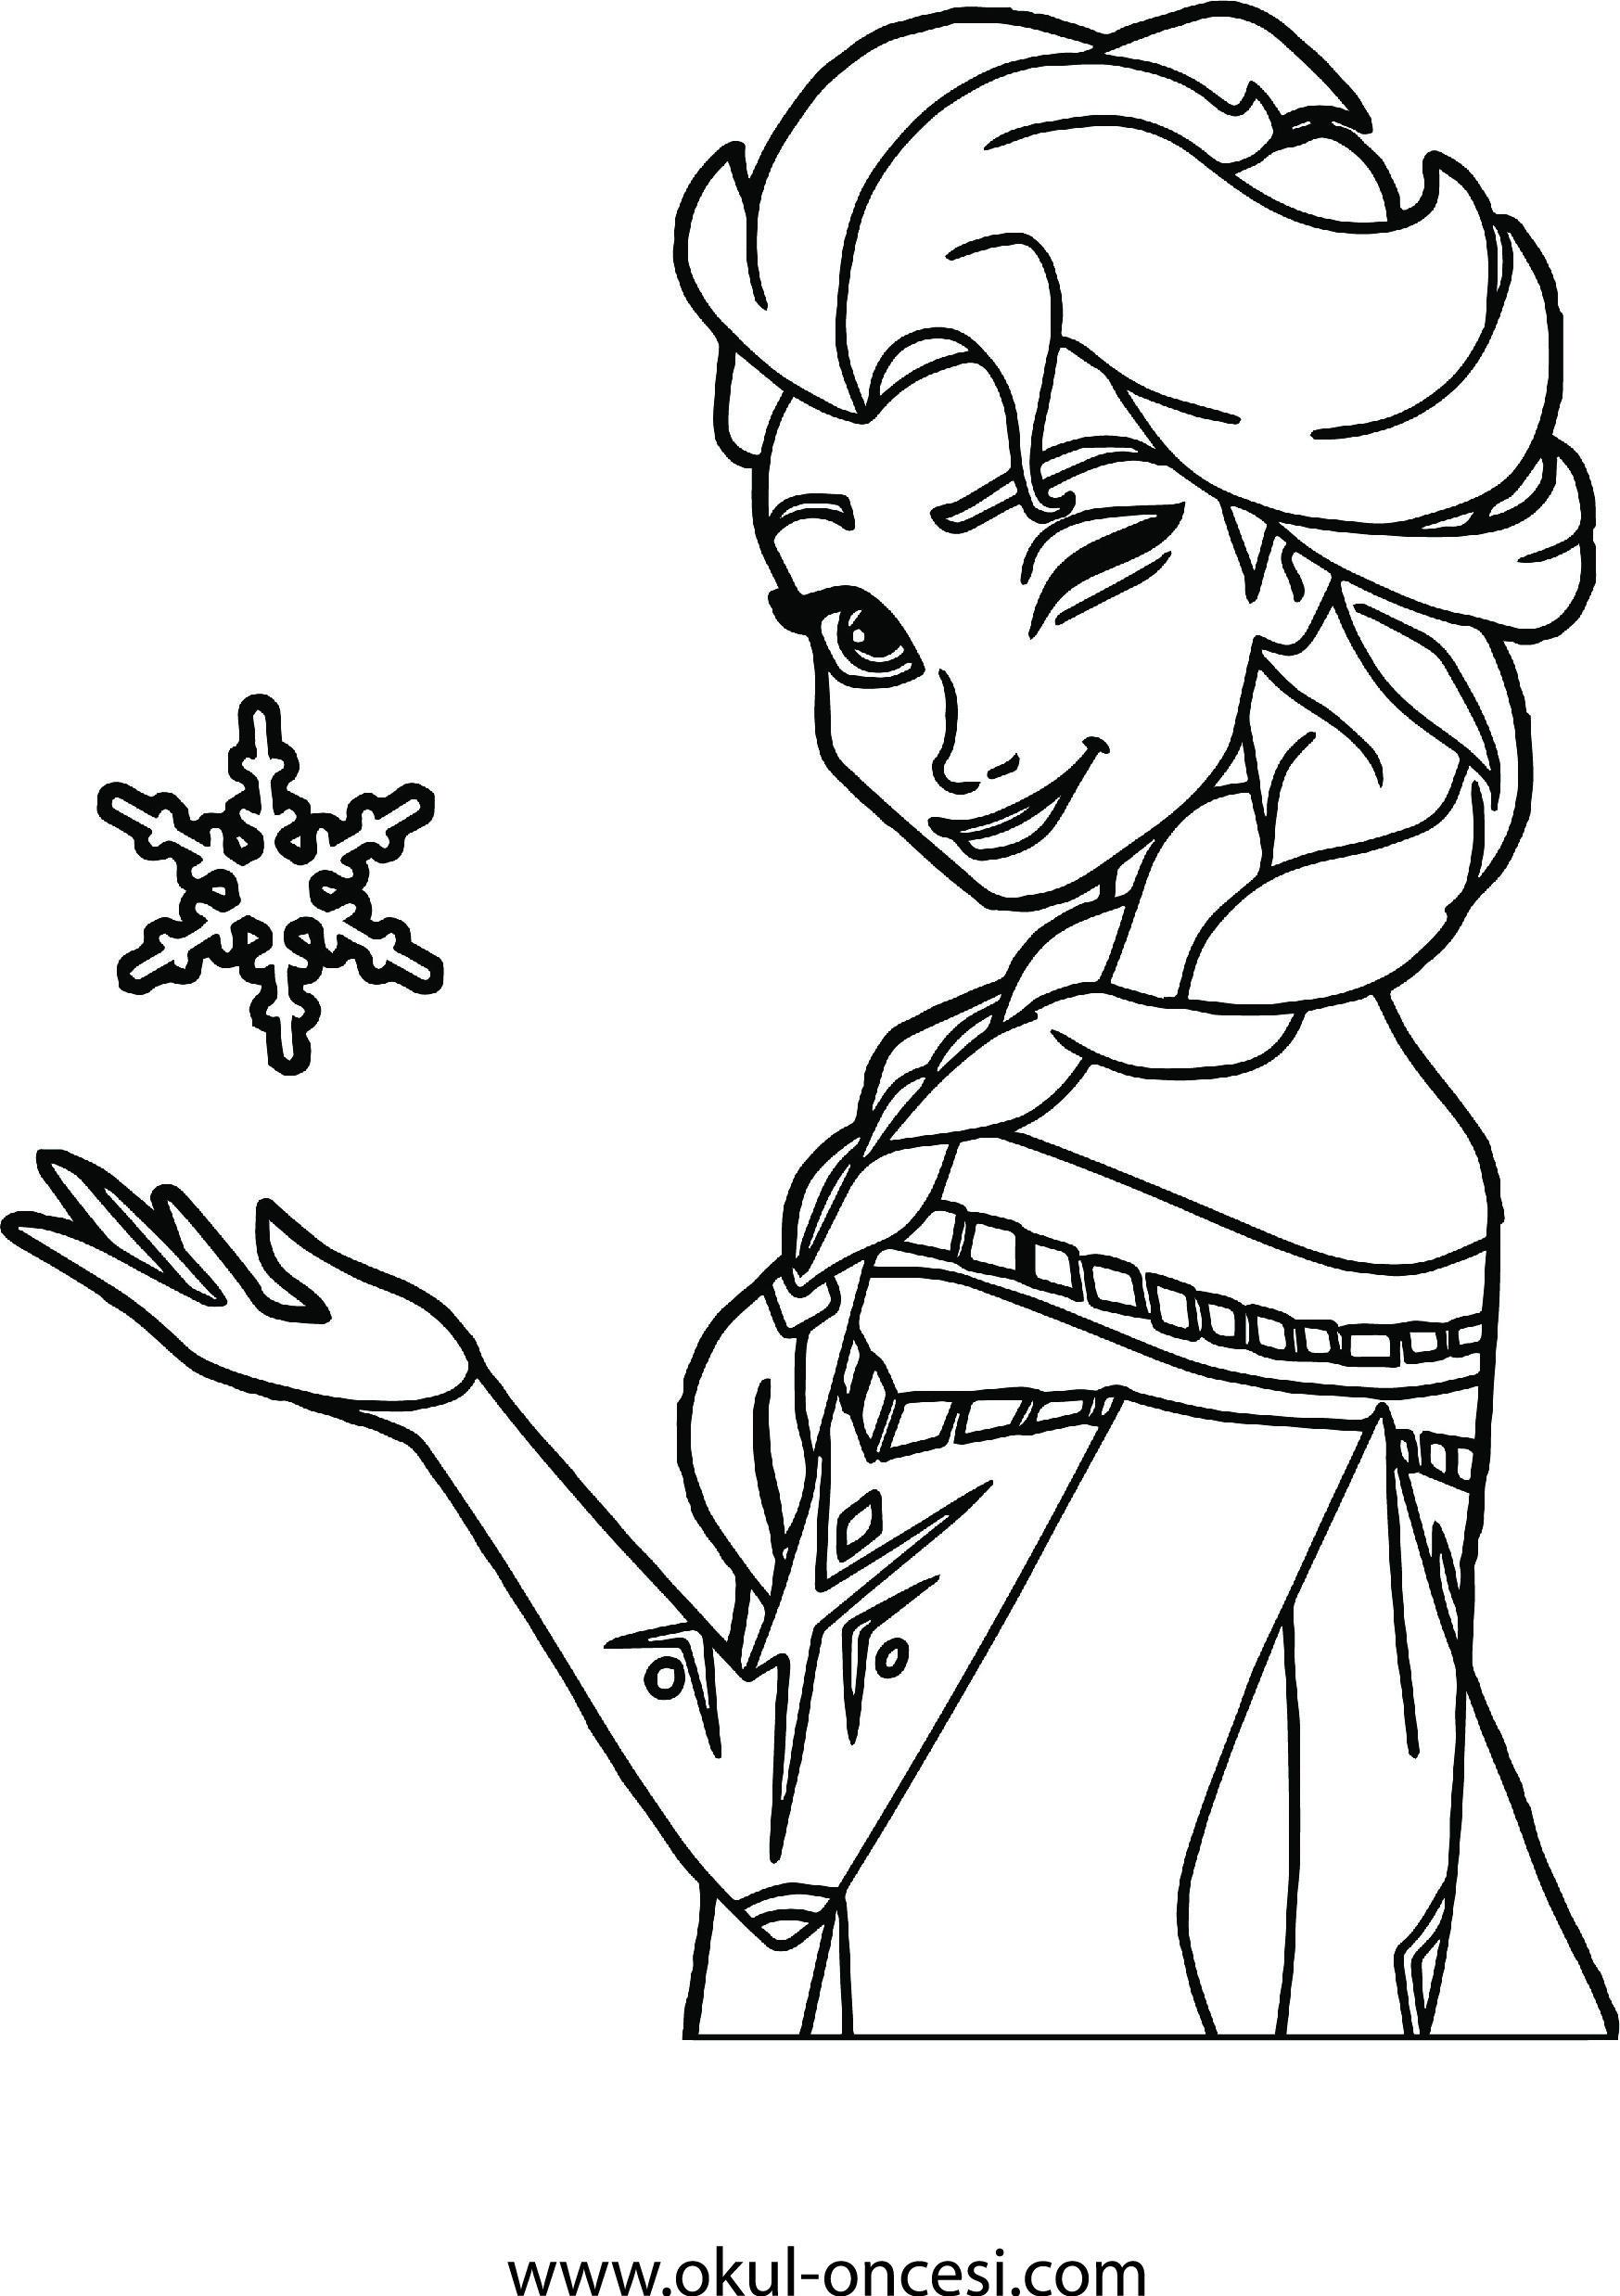 Frozen Anna Printable Coloring Page Frozen Elsa Boyama Sayfasi Boyama Sayfalari Frozen Elsa